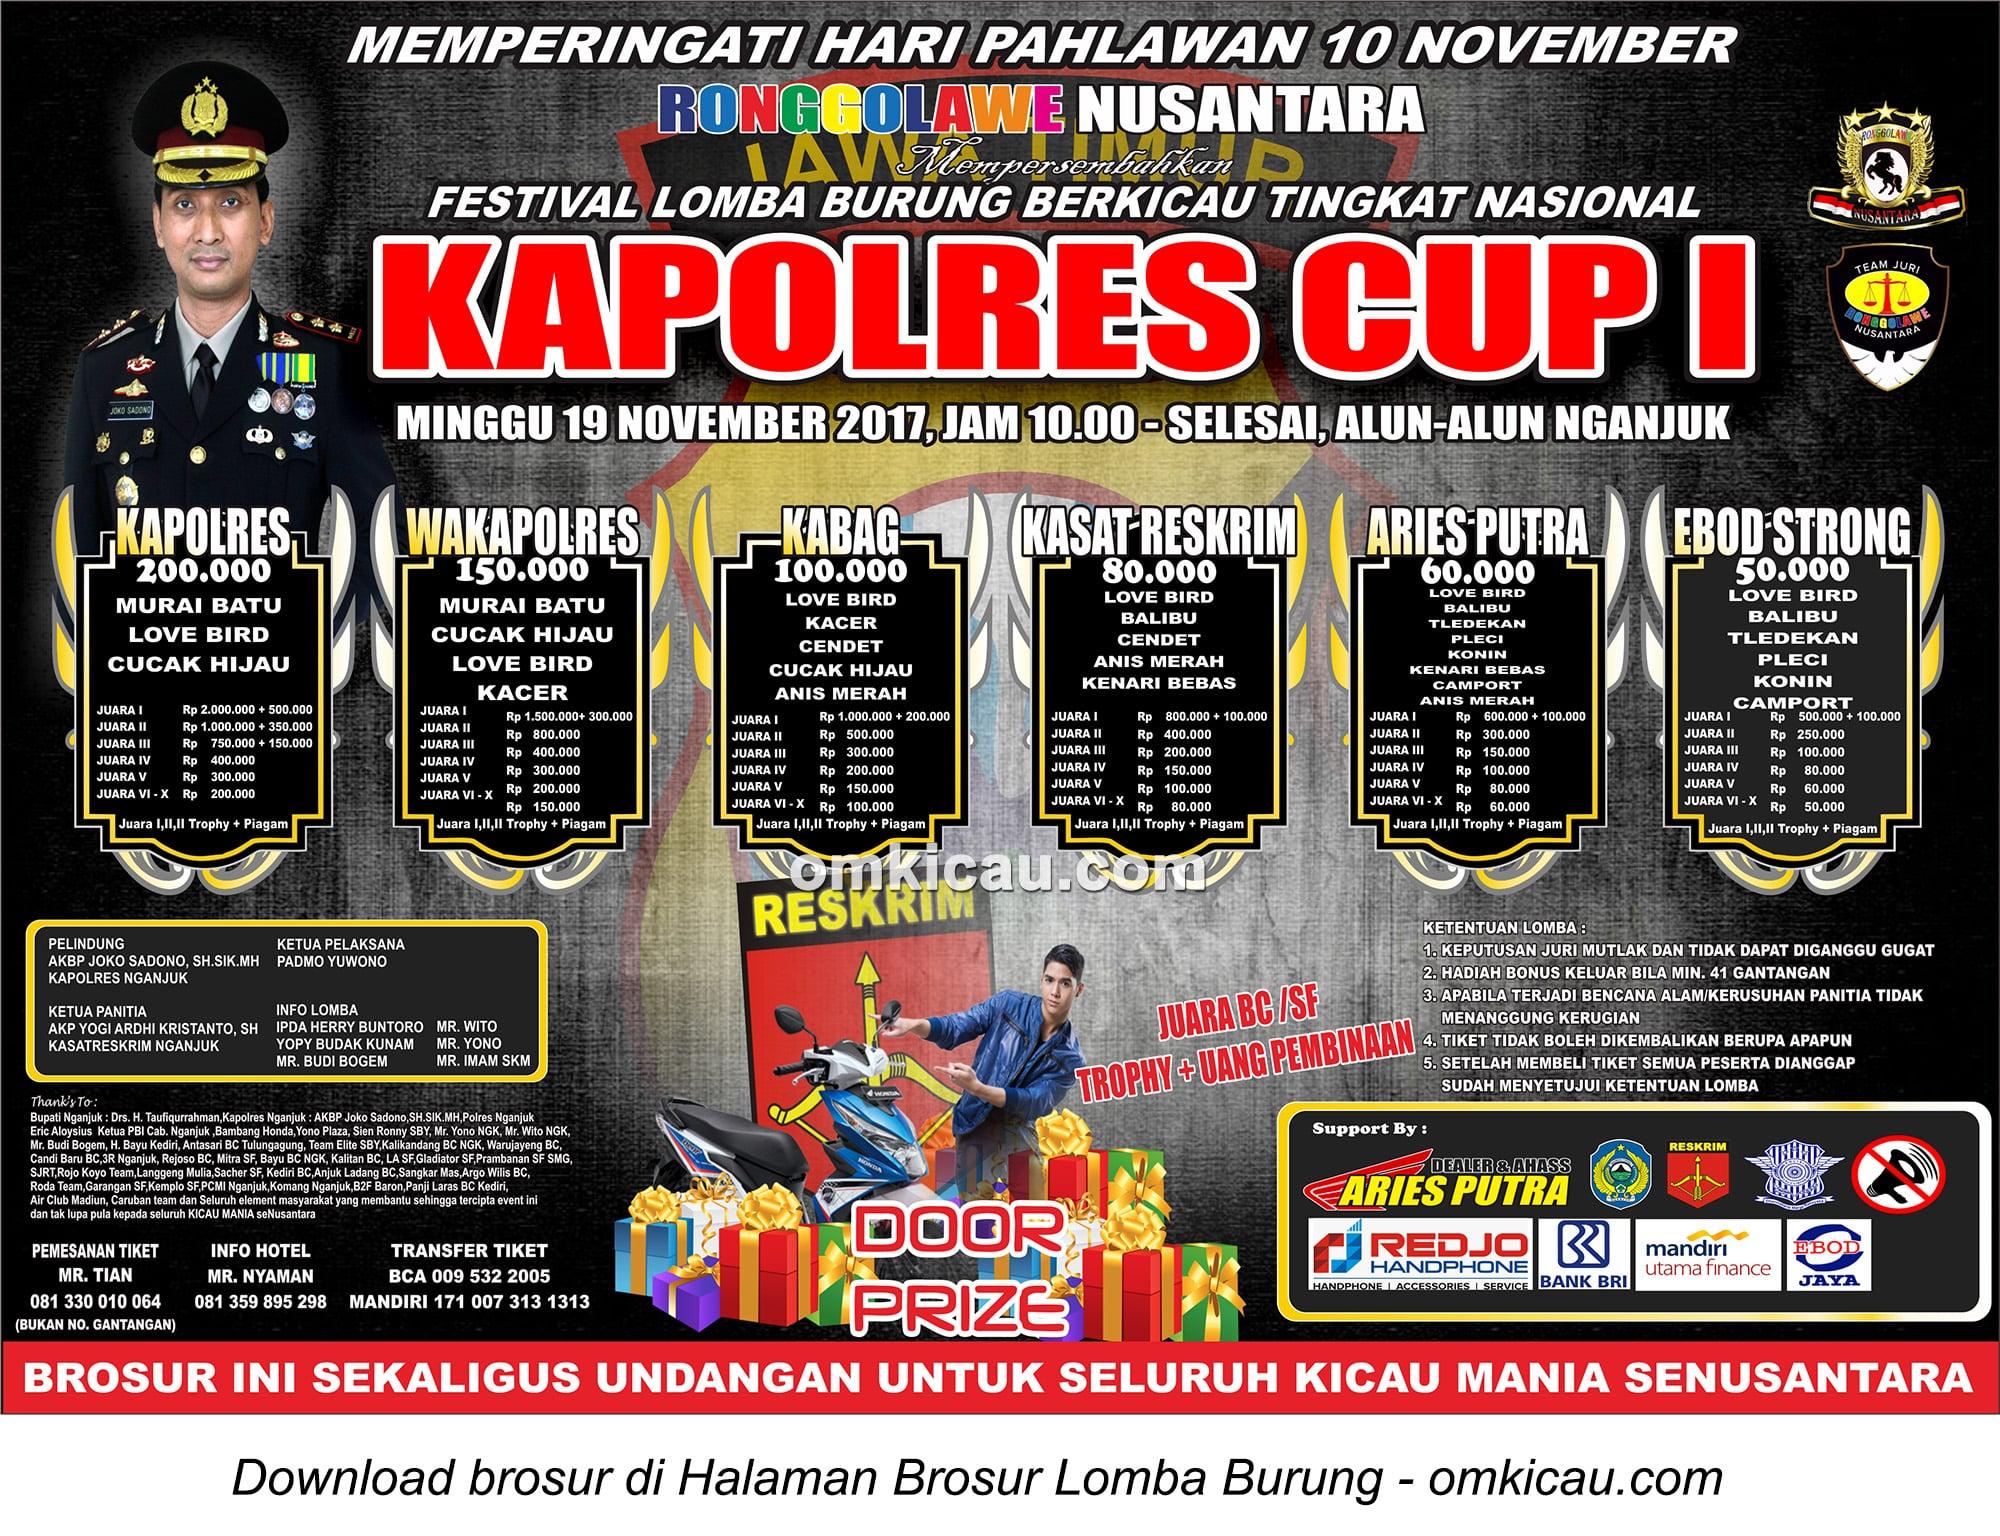 Kapolres Cup I Nganjuk